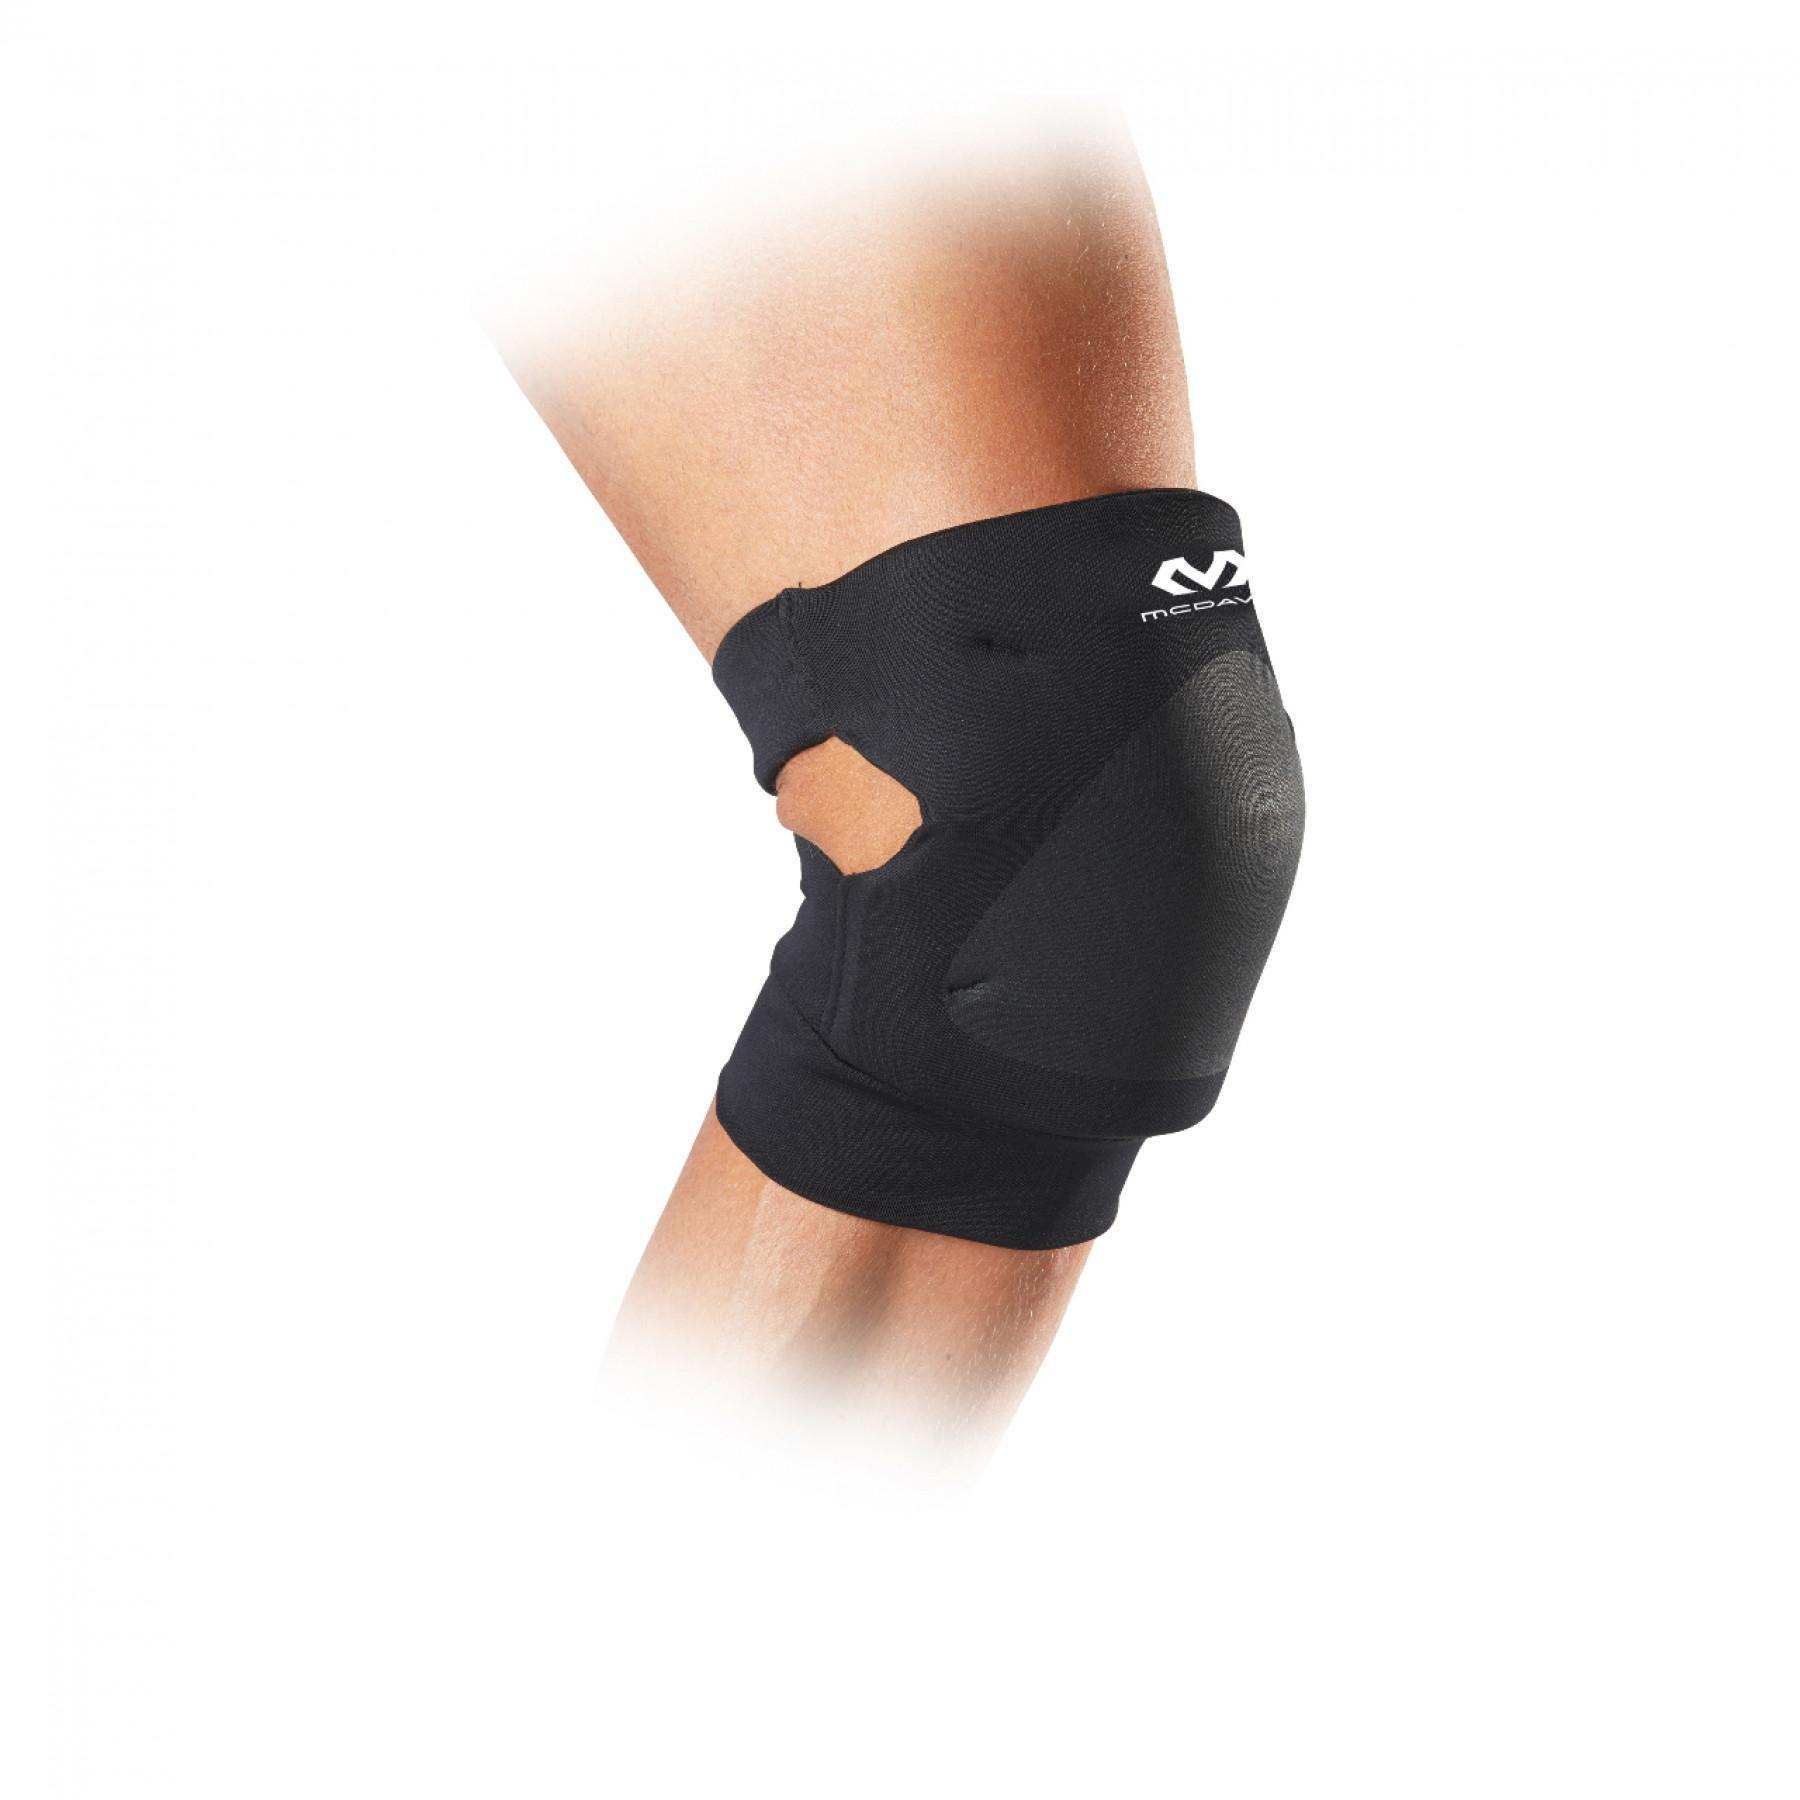 Knee pads McDavid Volley Pro (x2)